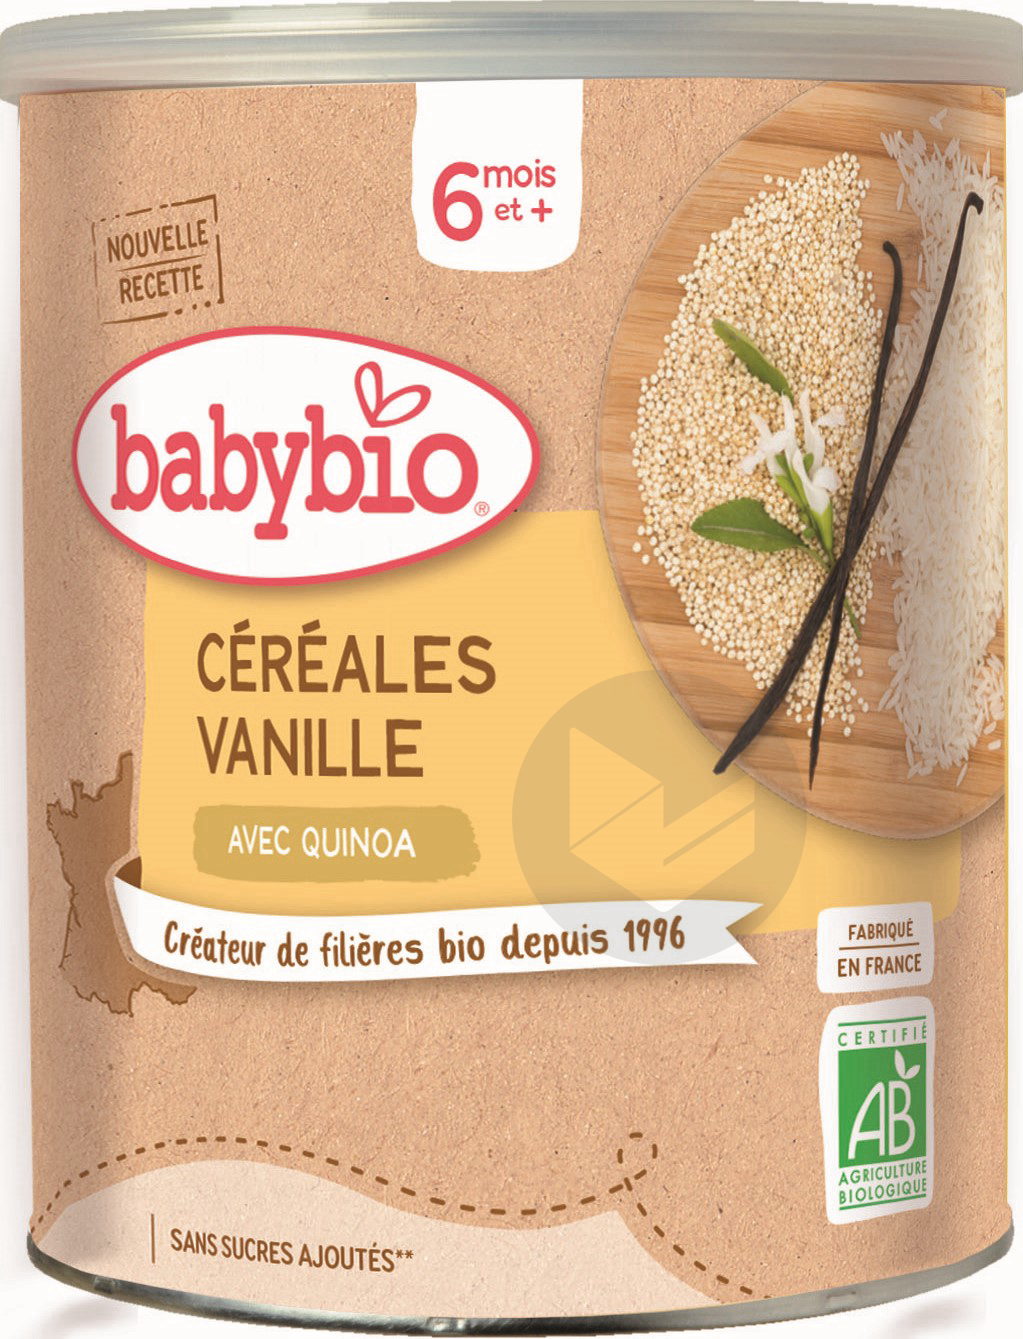 Cereales Vanille